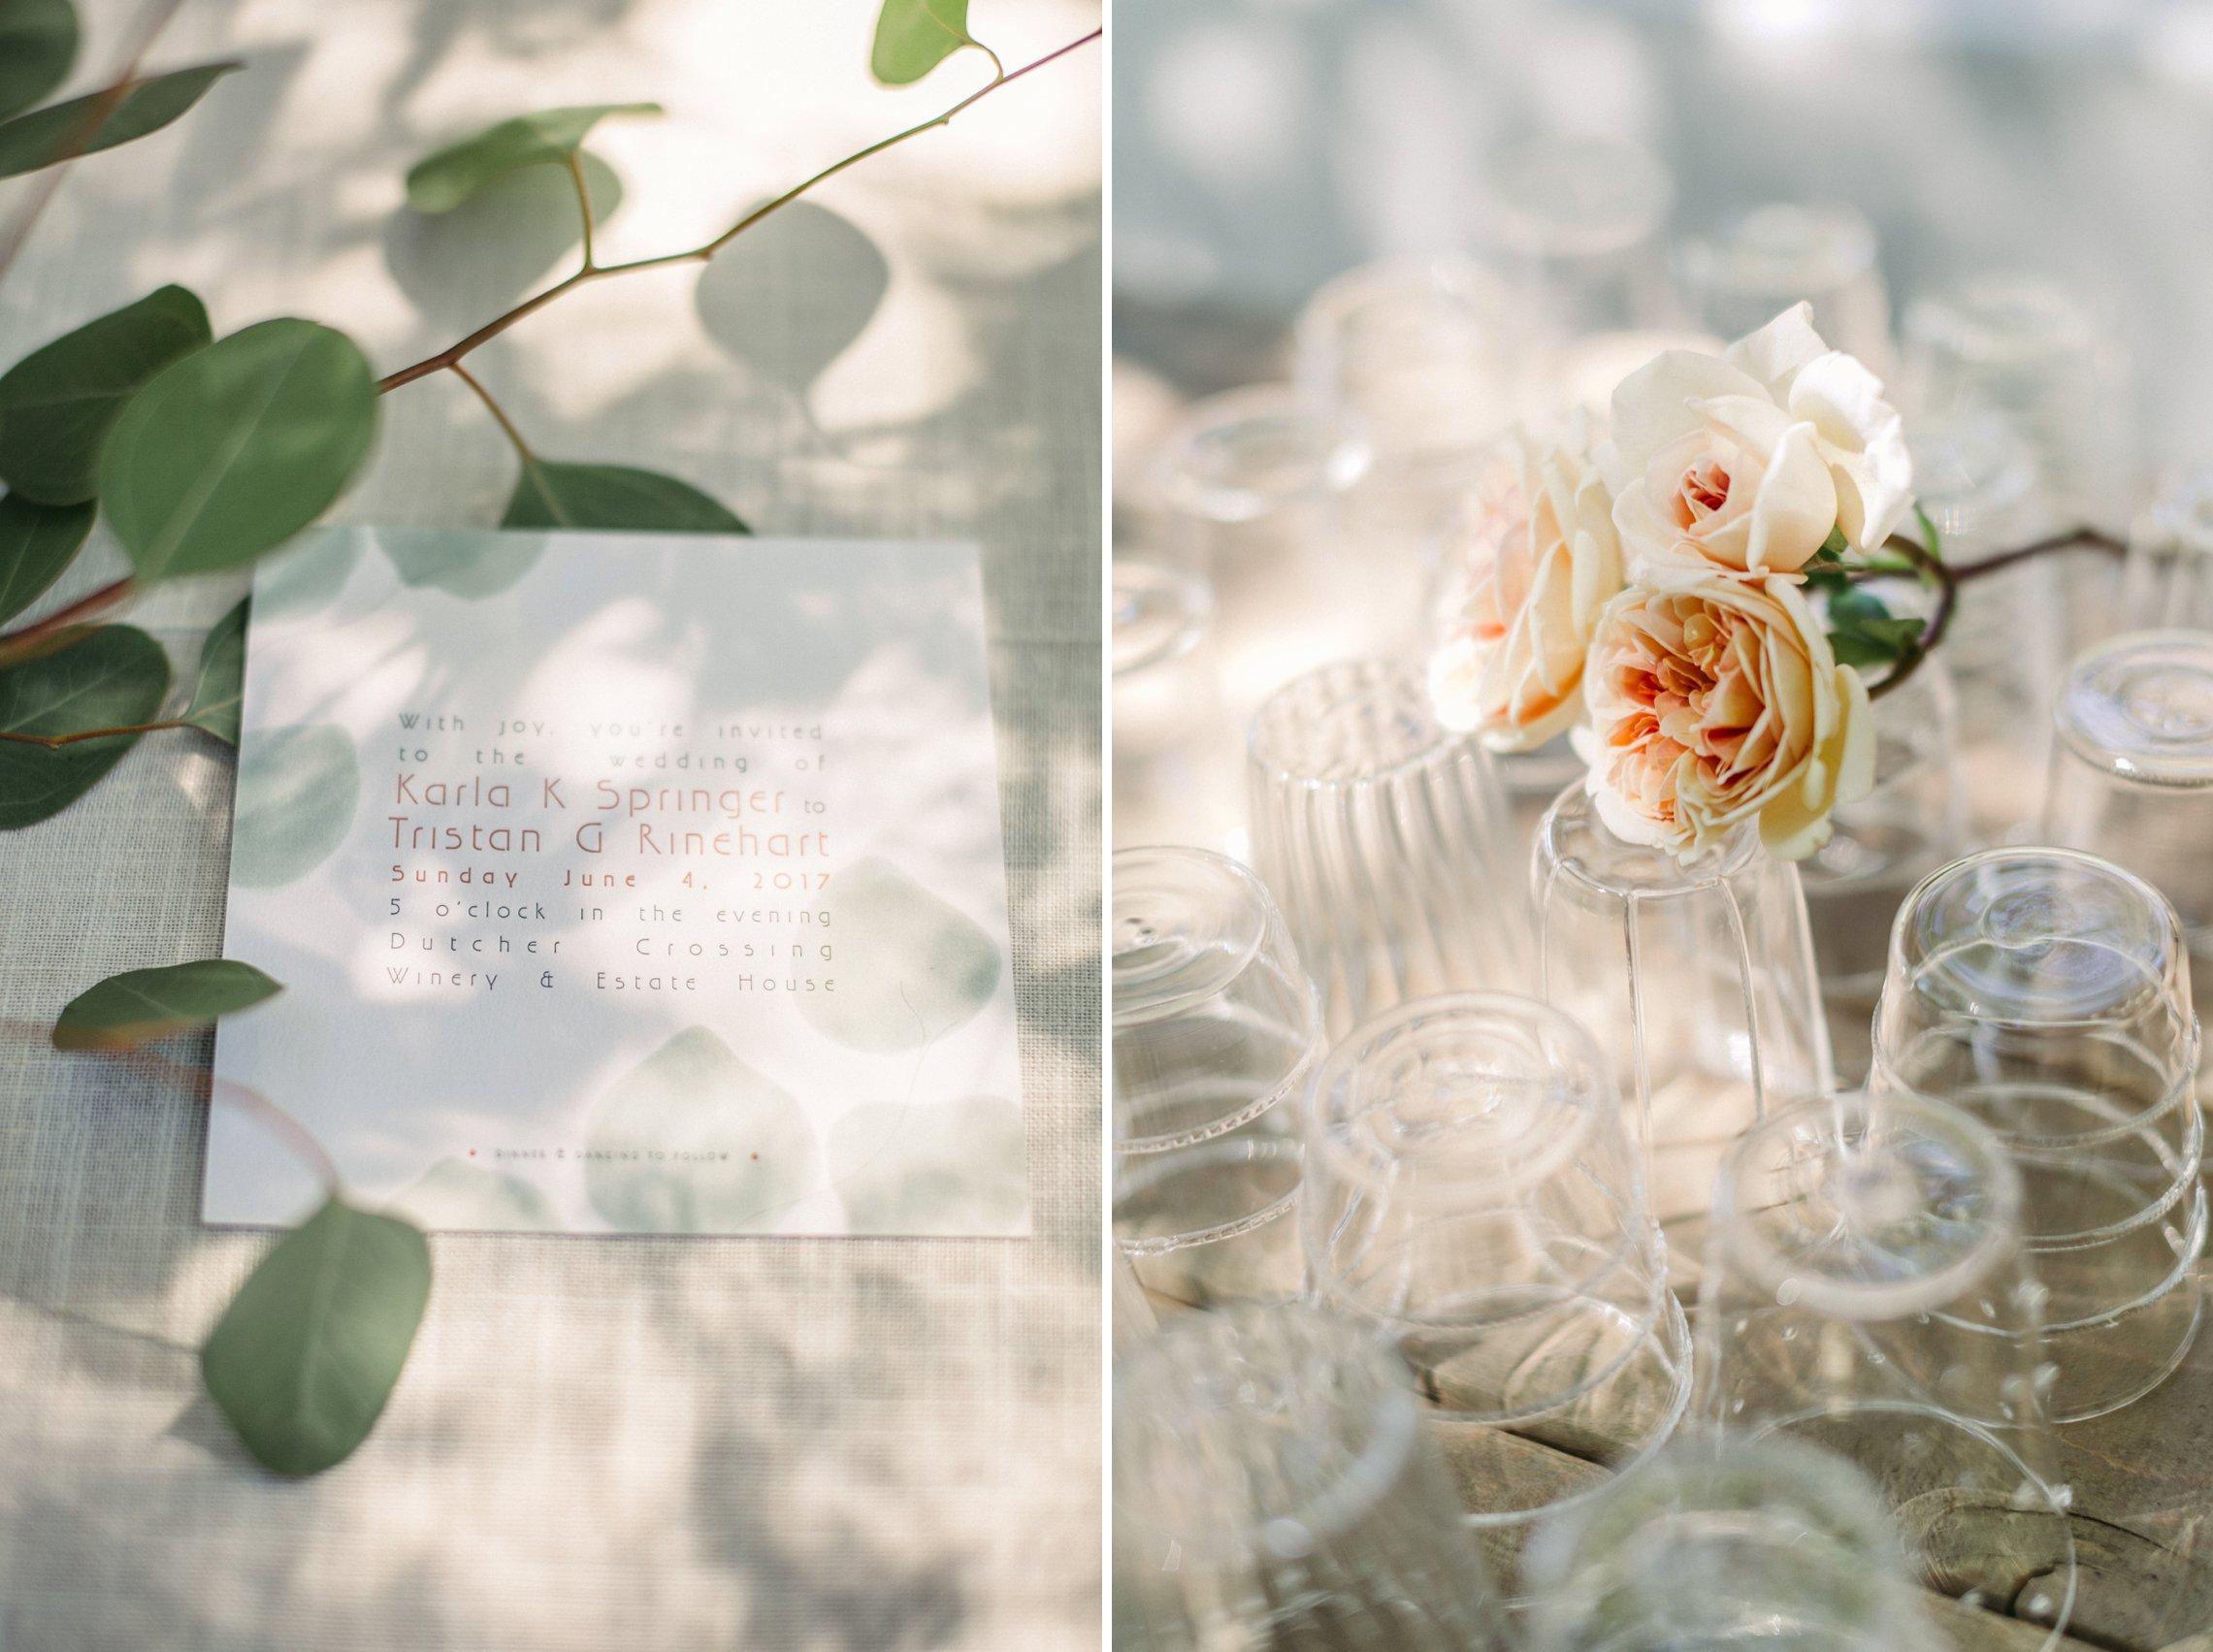 Healdsburg_Dutcher_Crossing_Winery_Wedding_0001.jpg